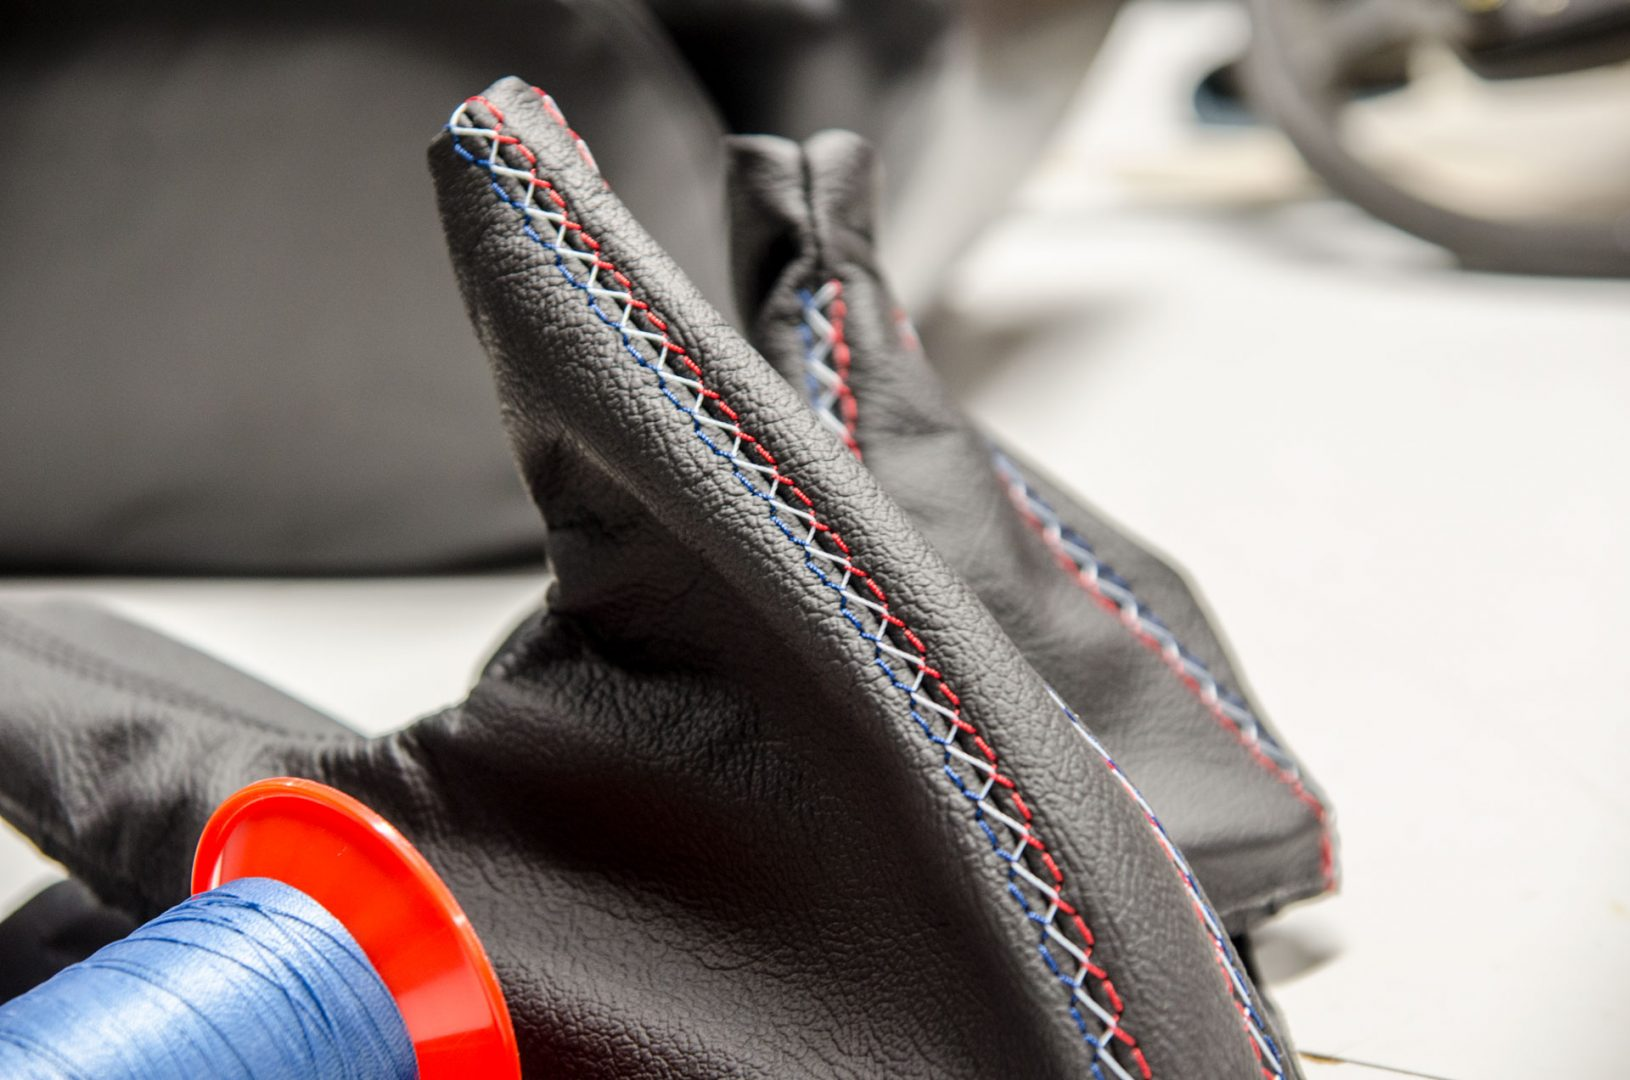 Sattlerei K.M. Lederdesign, Polsterer, Lederverarbeitung polstern bmw, Lederinterieur für Autos